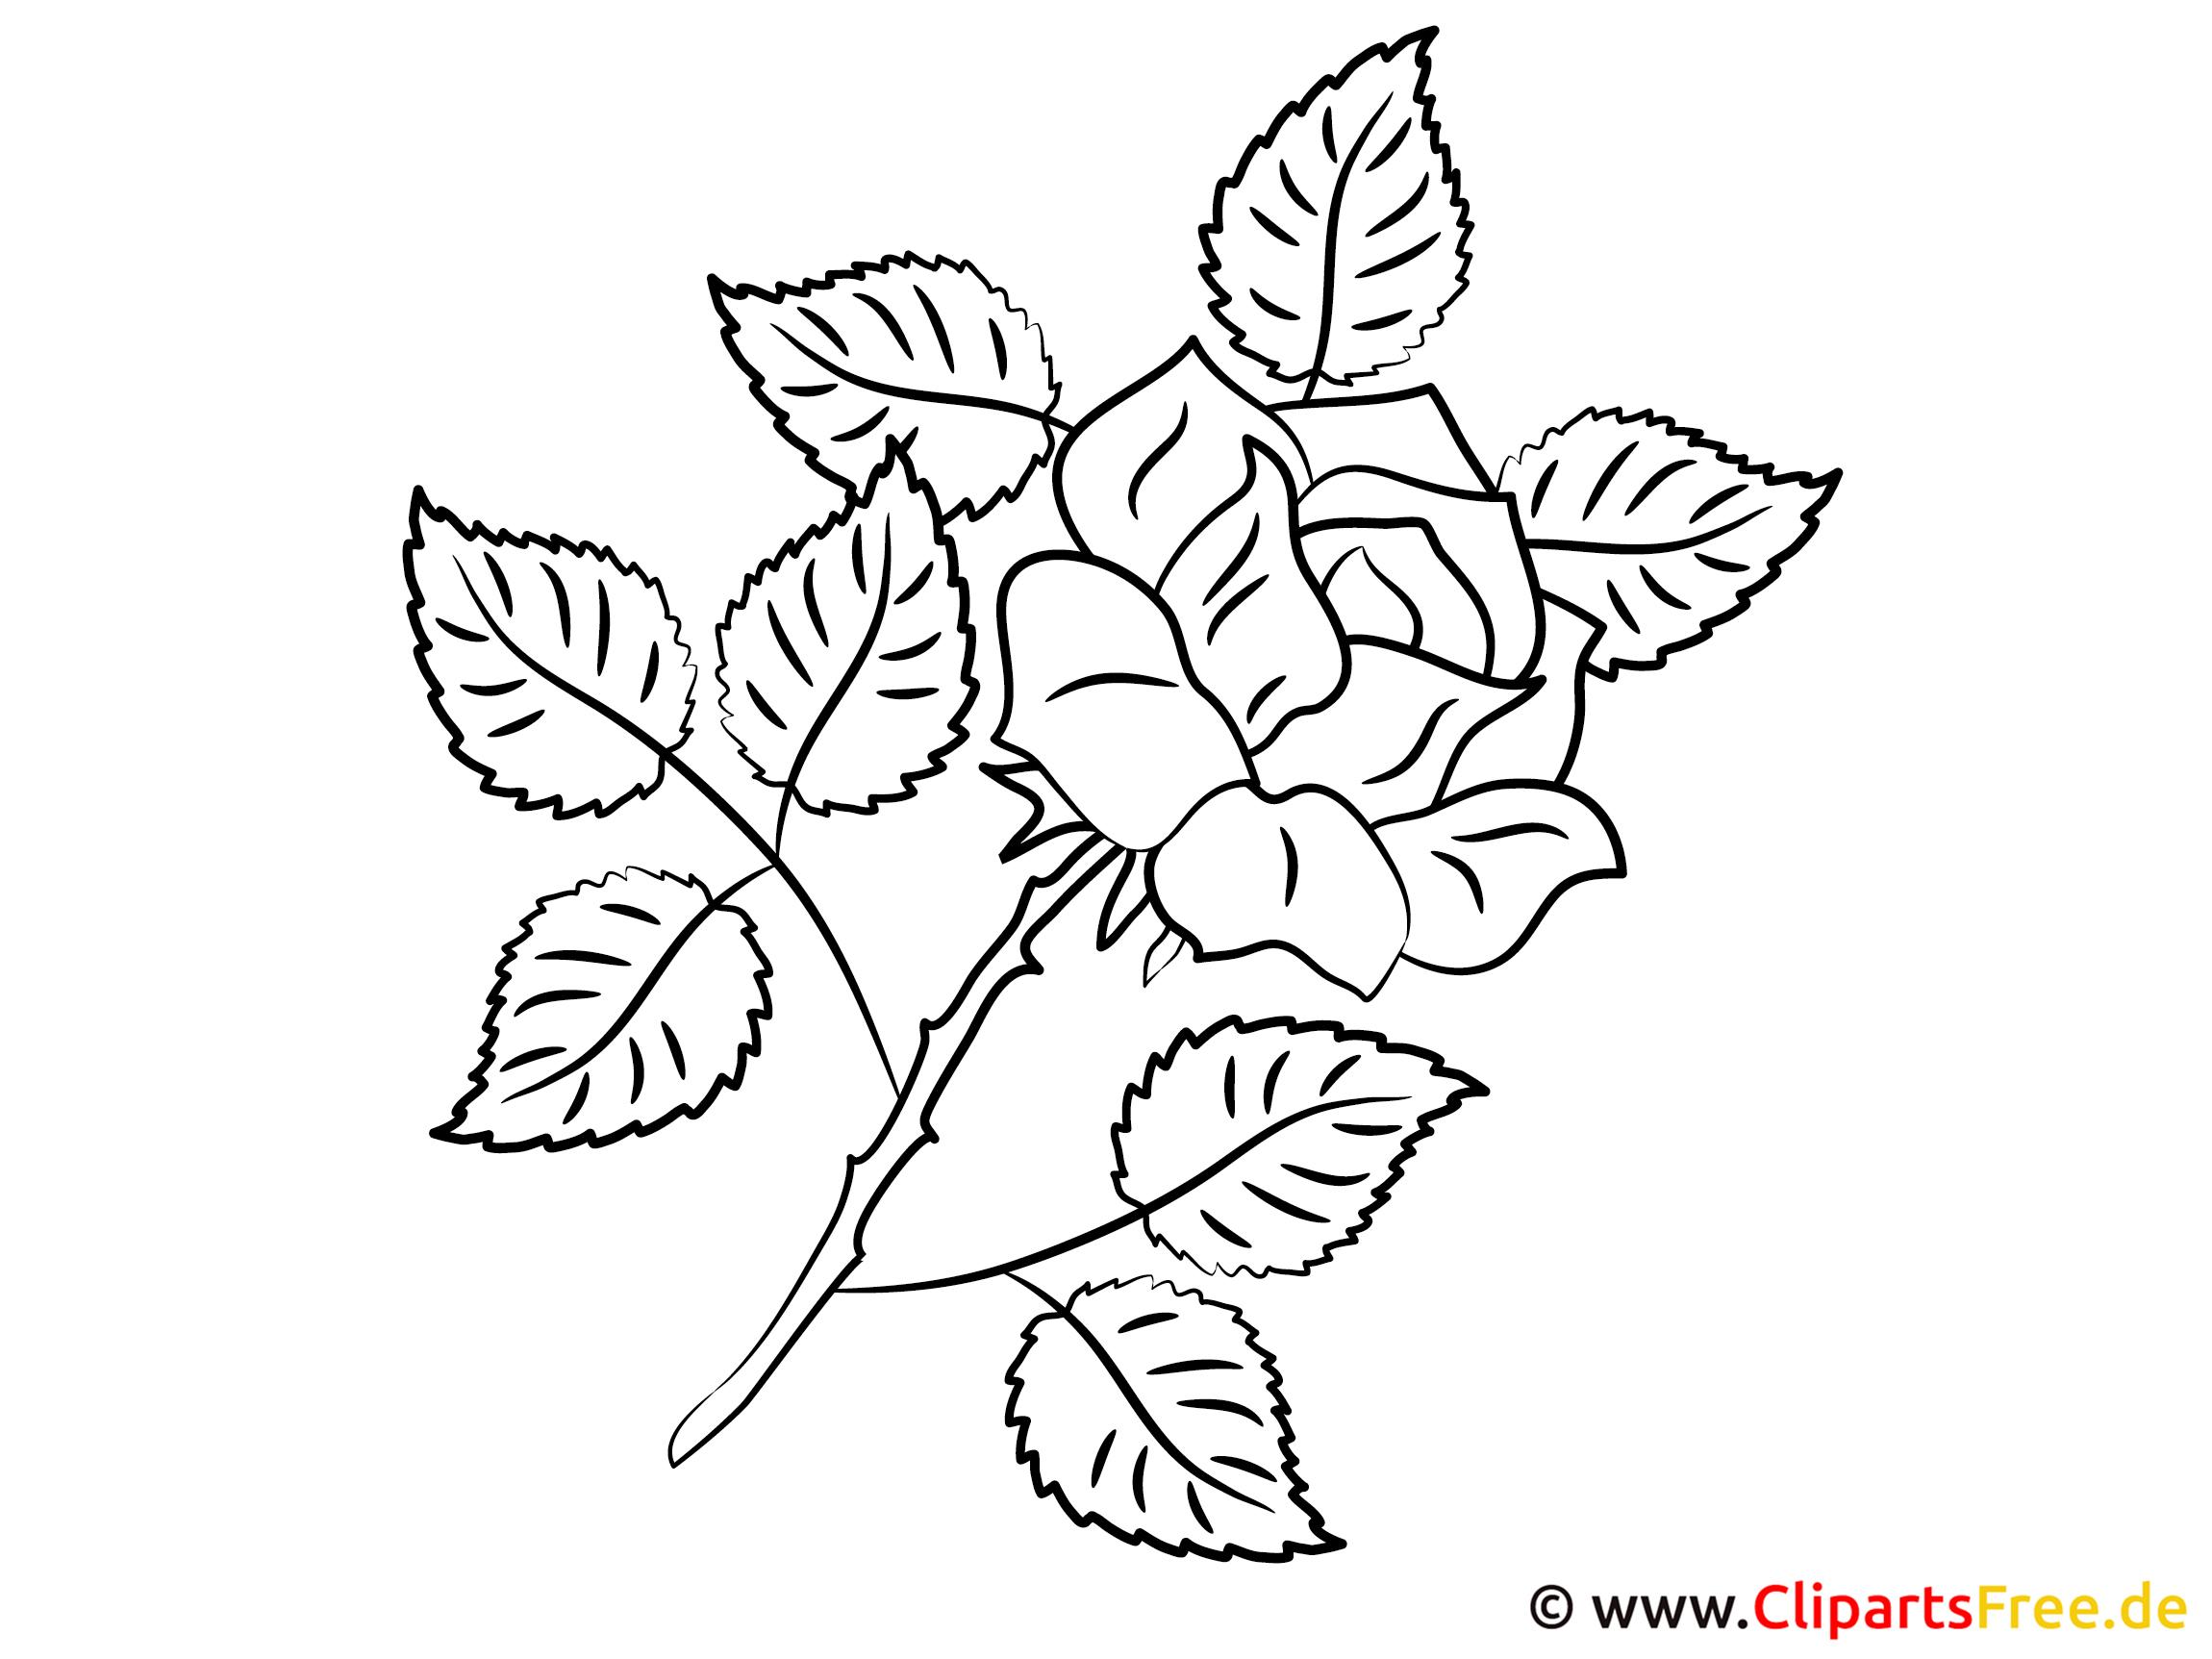 Clipart zum Ausmalen Rose